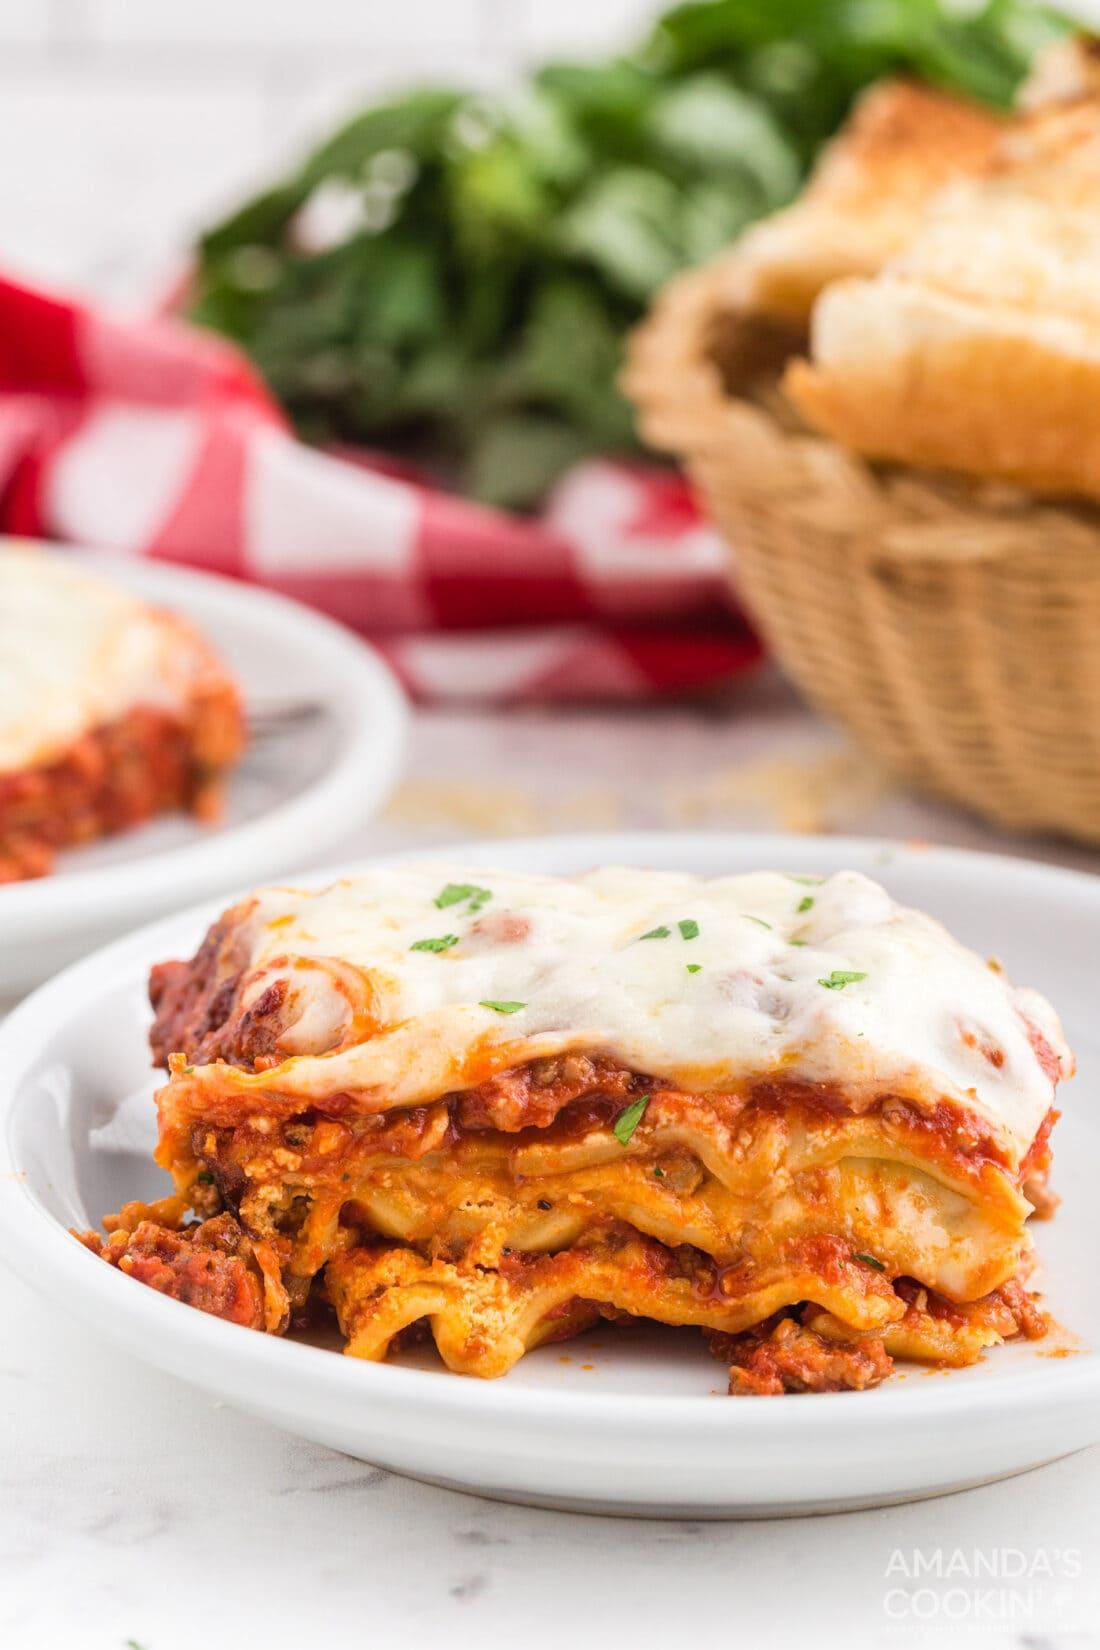 crockpot lasagna on a plate